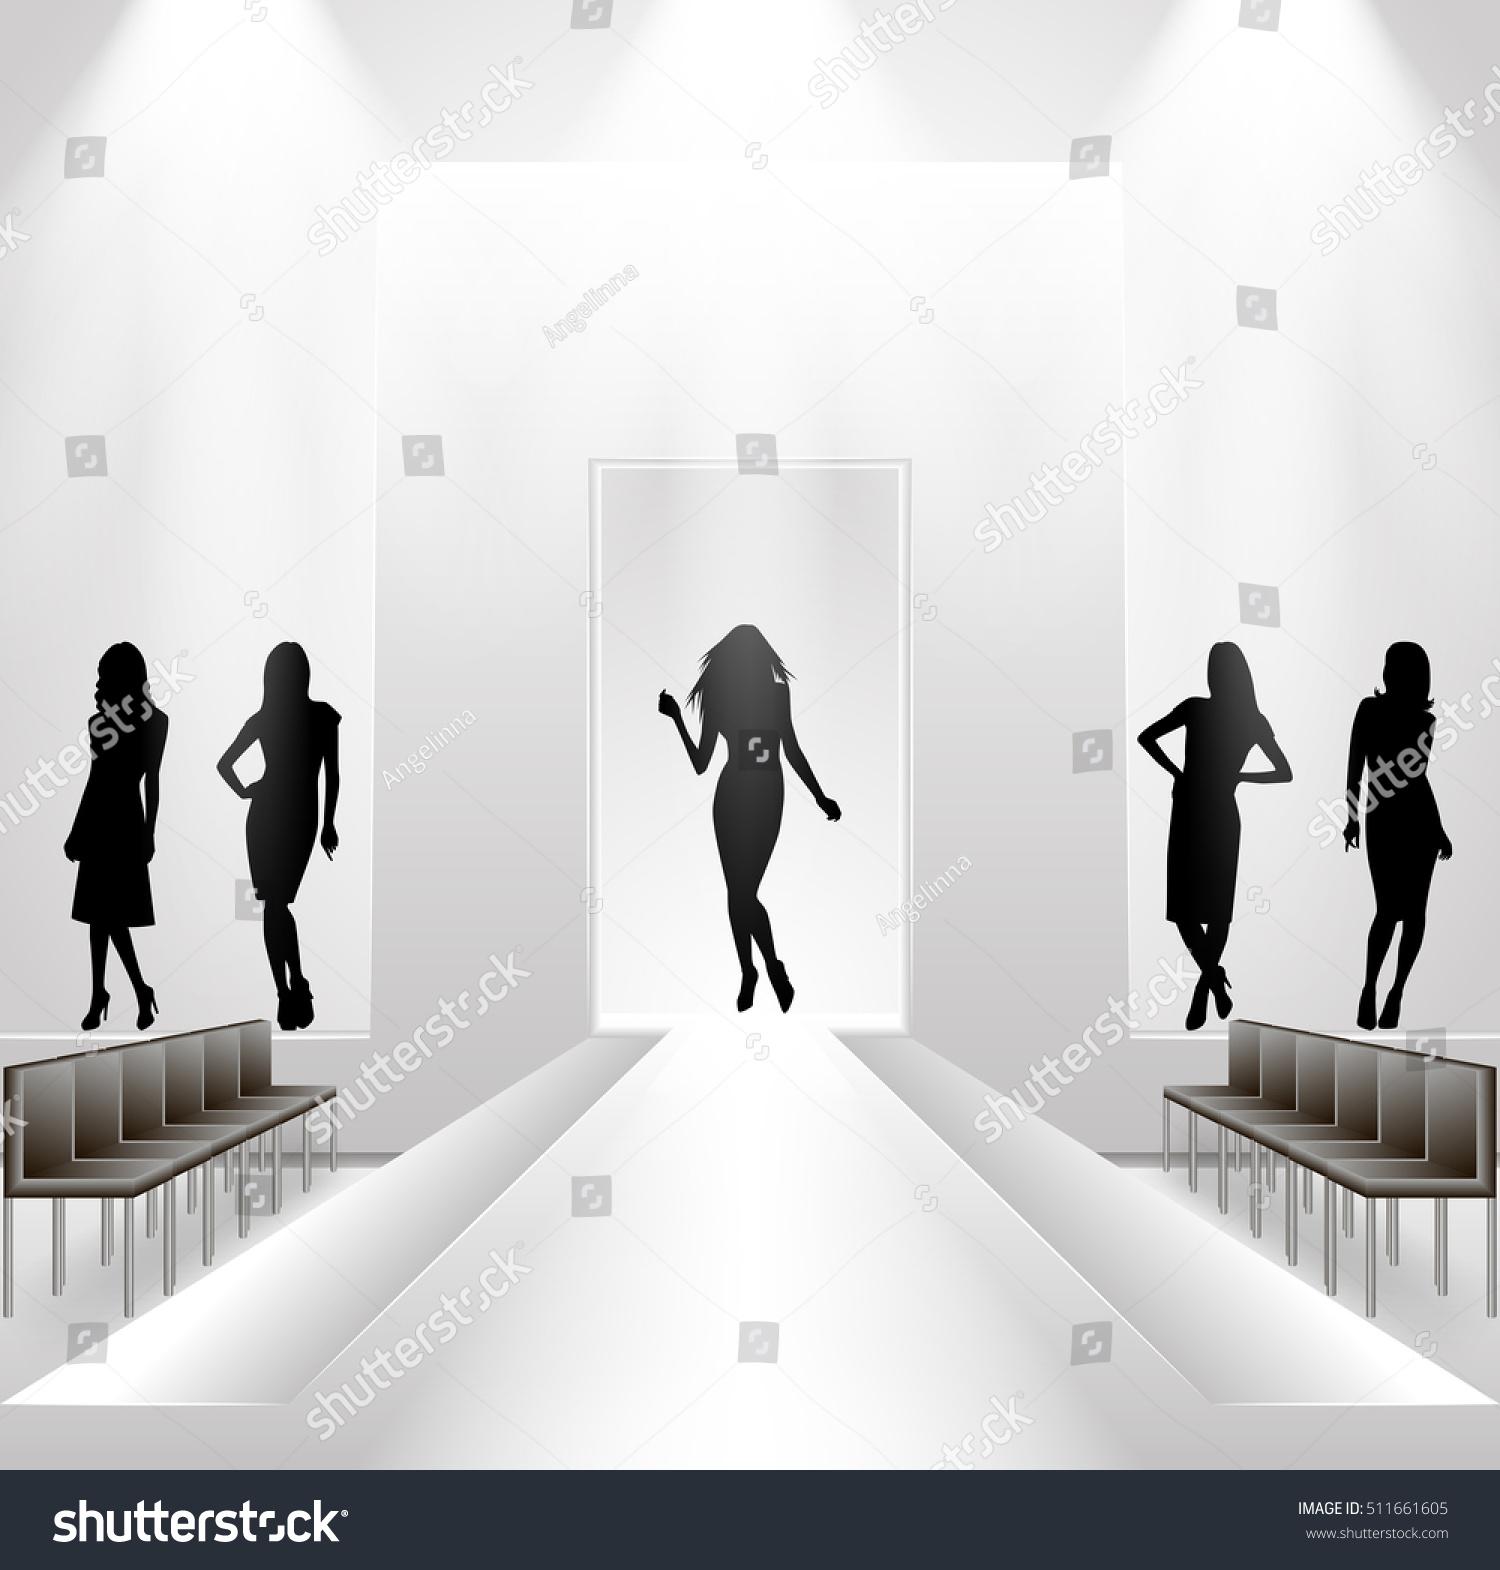 Illustration Fashion Show Rehearsal Female Silhouettes Stock Vector